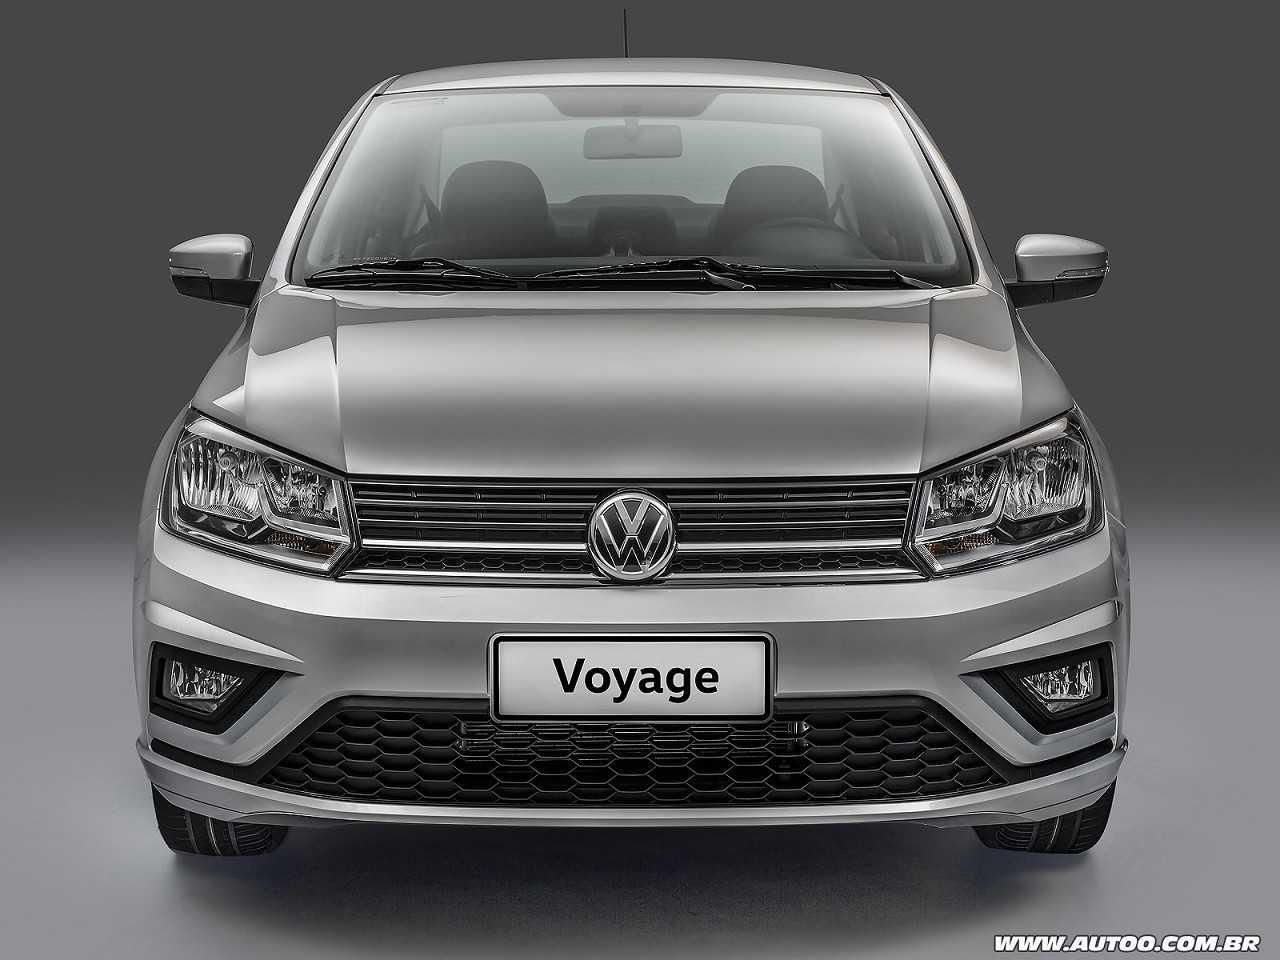 VolkswagenVoyage 2019 - frente